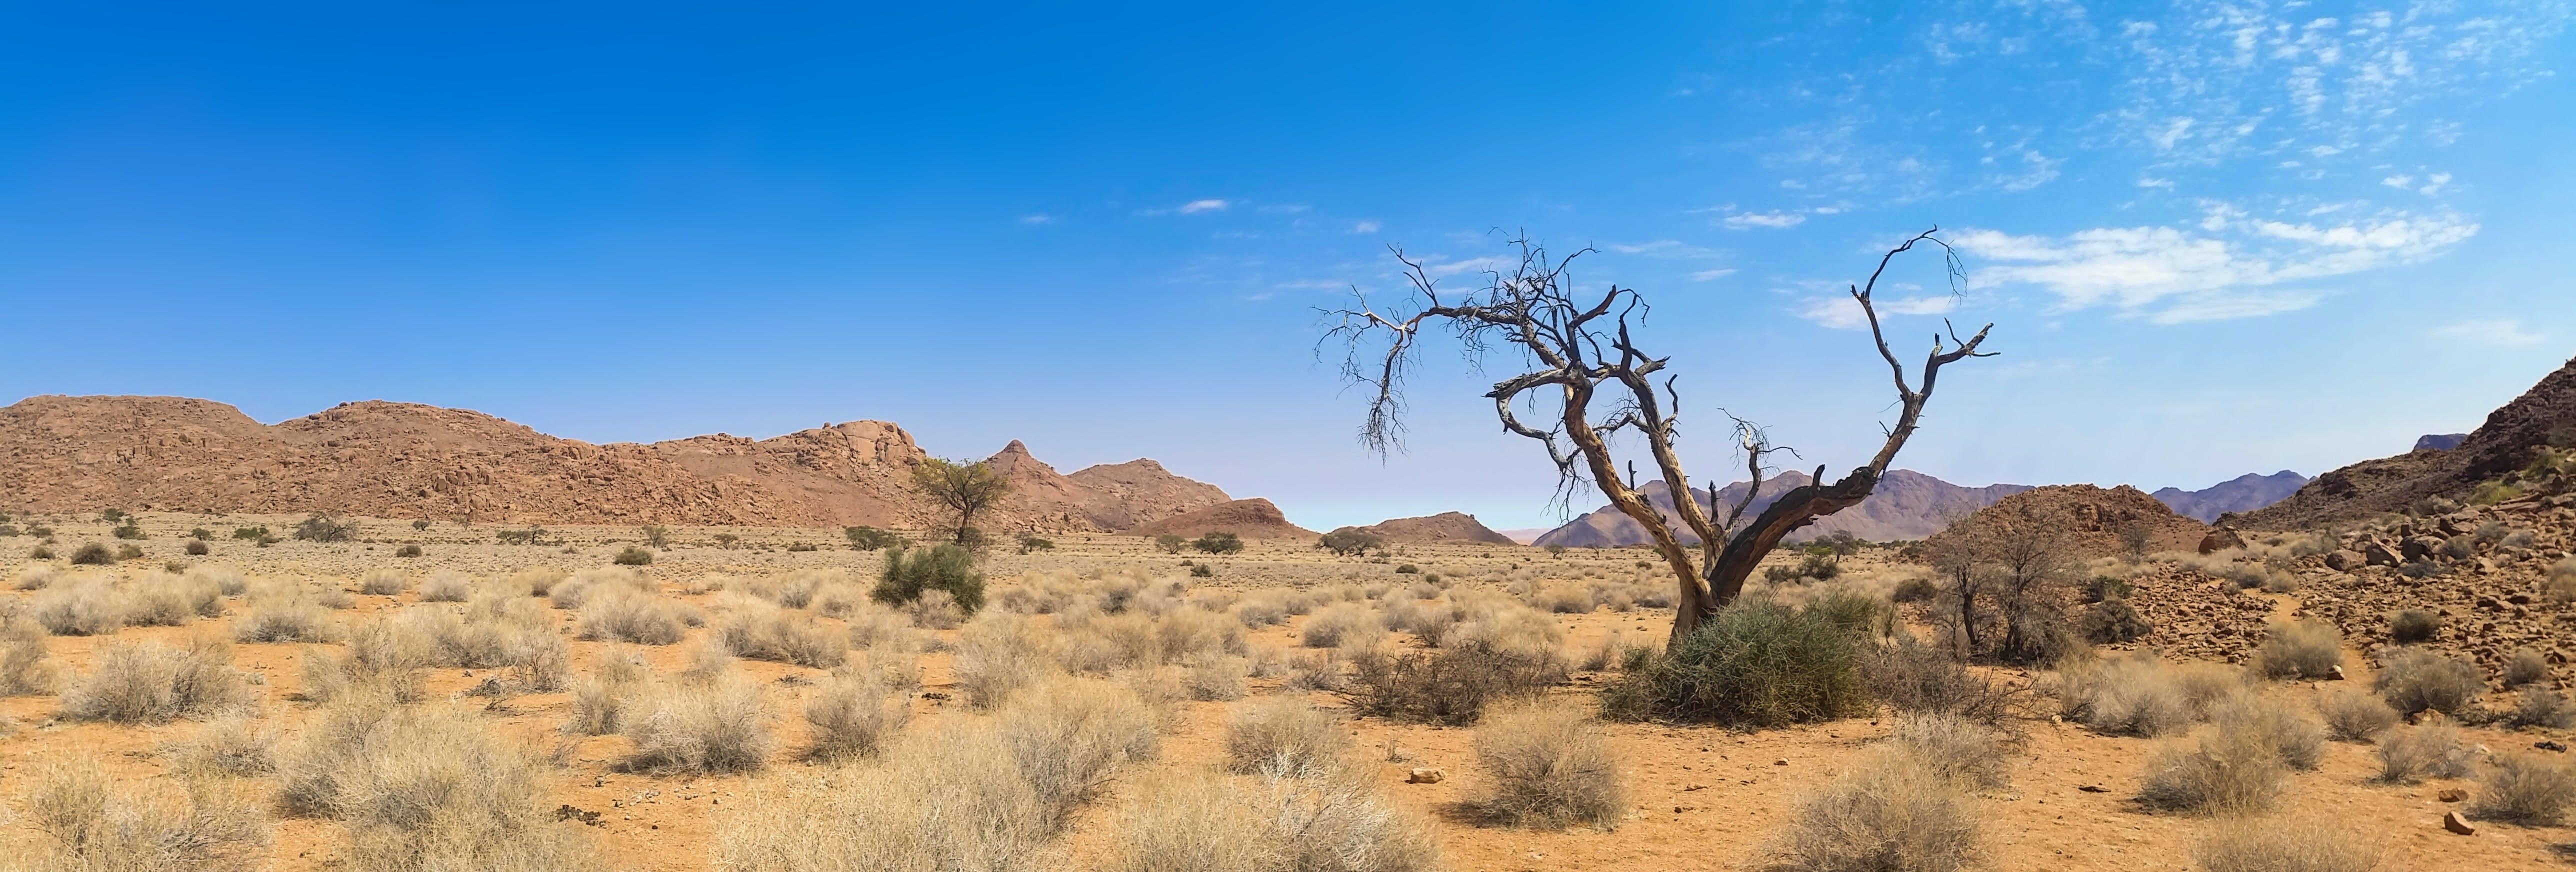 Kostnadsfri bild av afrika, berg, bred, buske